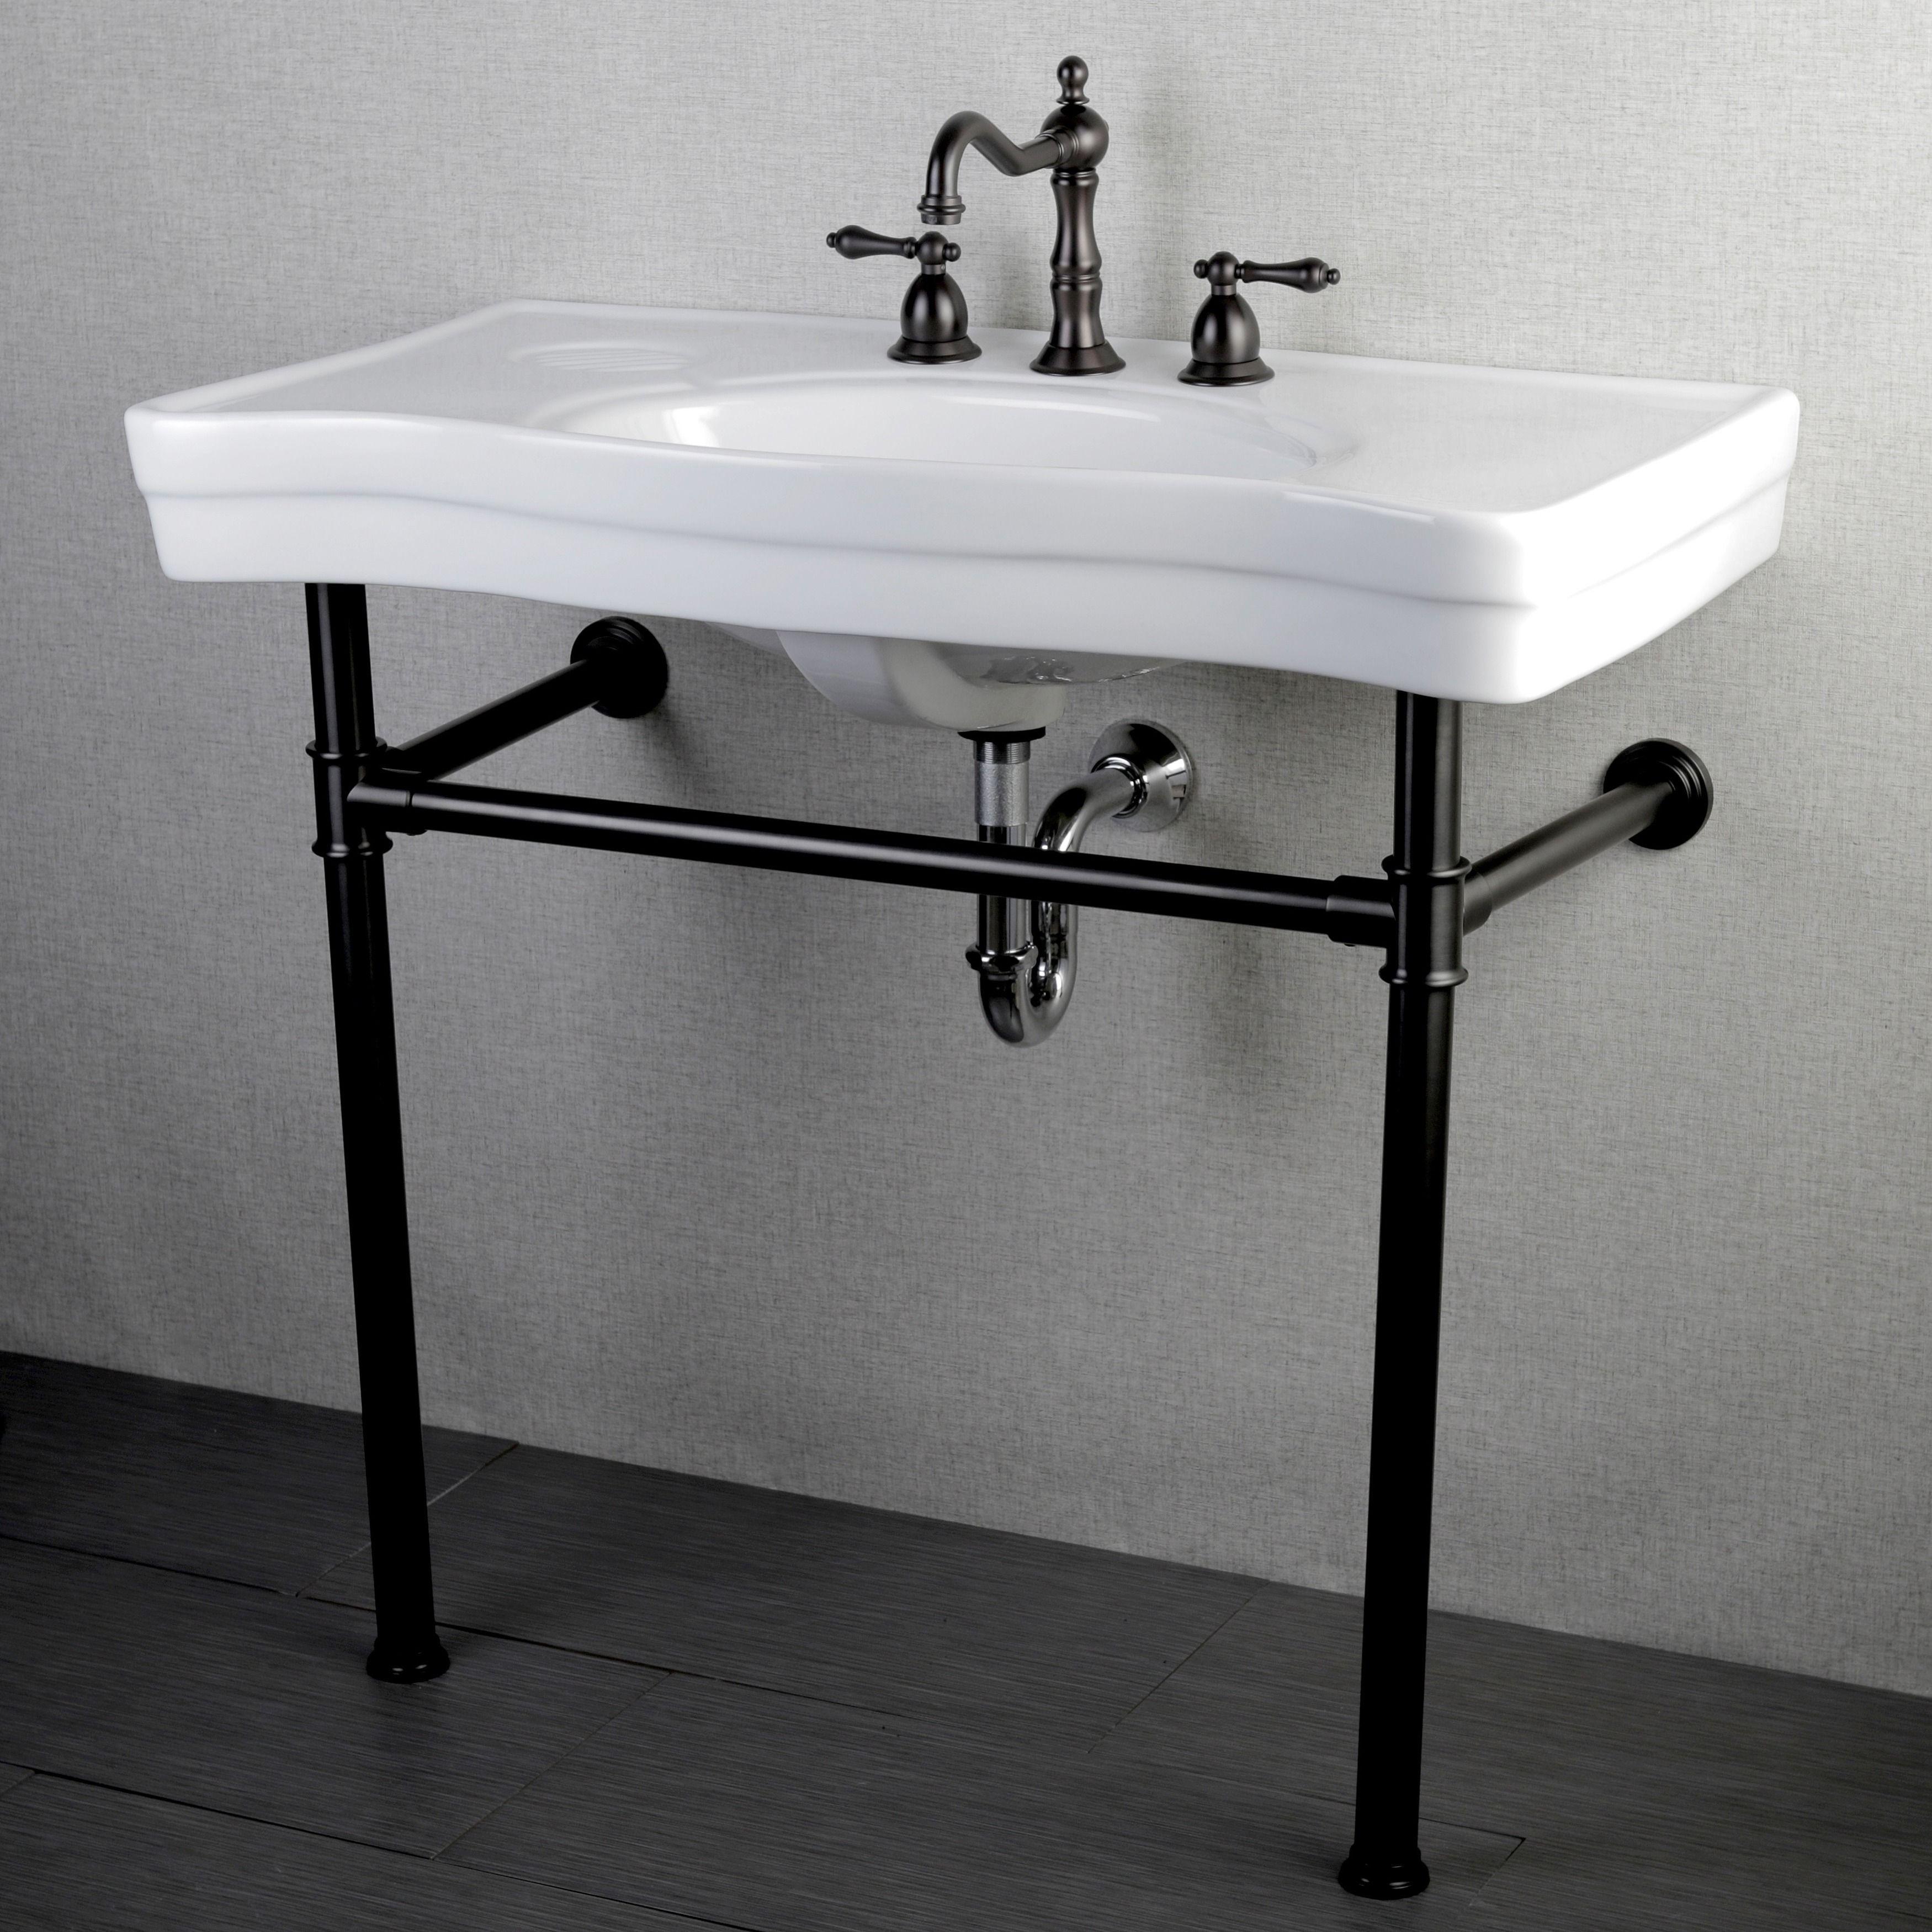 pedestal sink or vanity in small bathroom%0A Imperial Vintage Oil Rubbed Bronze Pedestal Bathroom Sink Vanity   Overstock Shopping  Great Deals on Bathroom Sinks